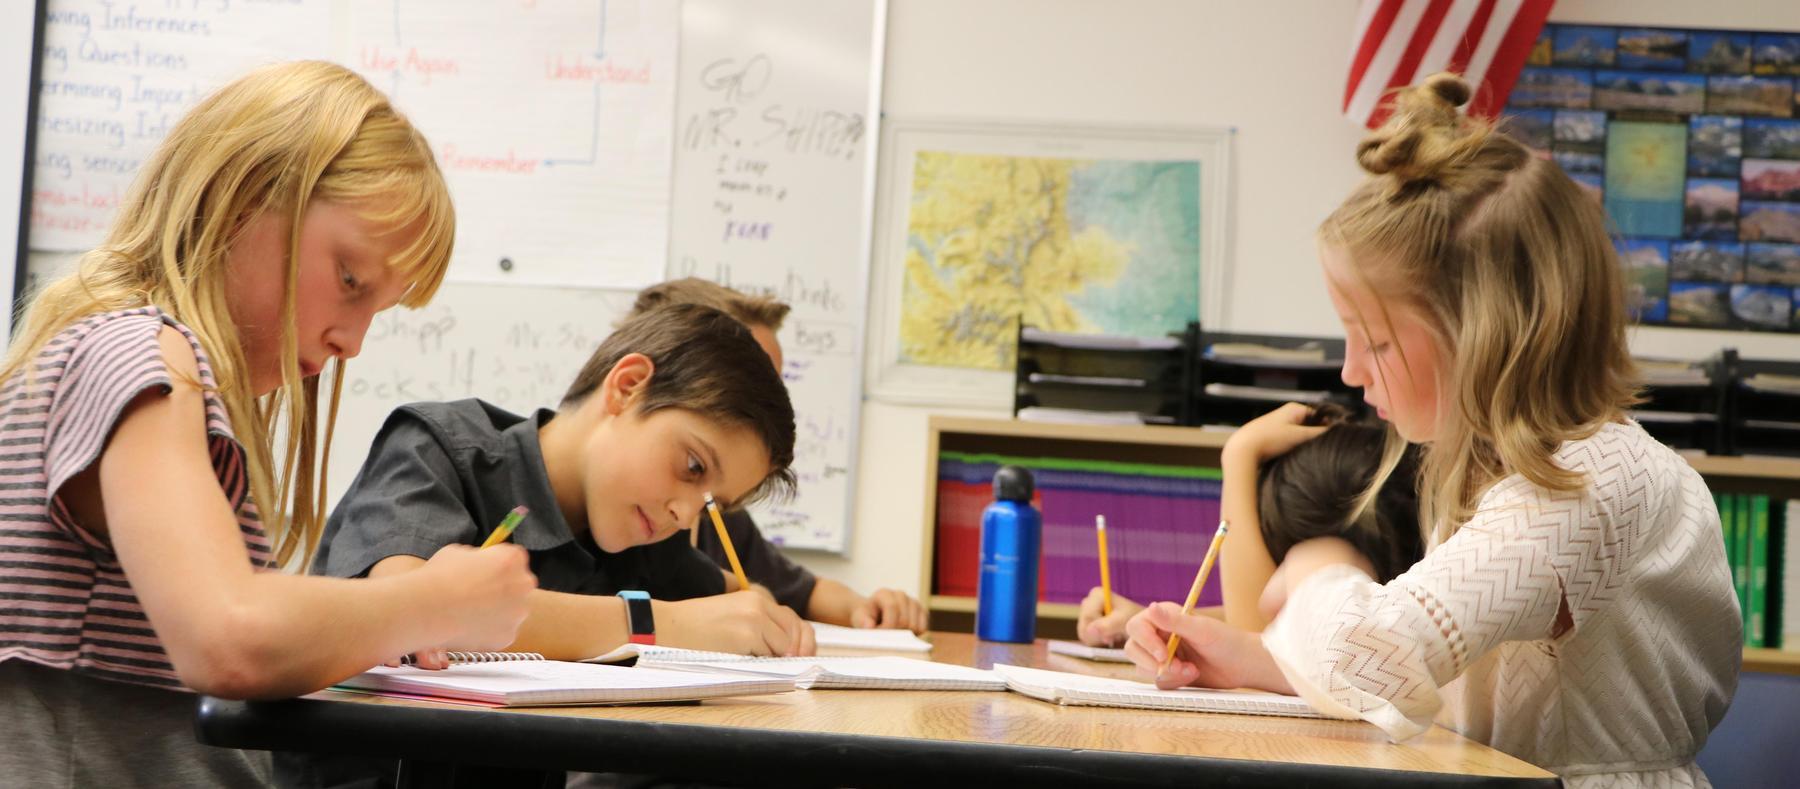 Durango School District 9-R